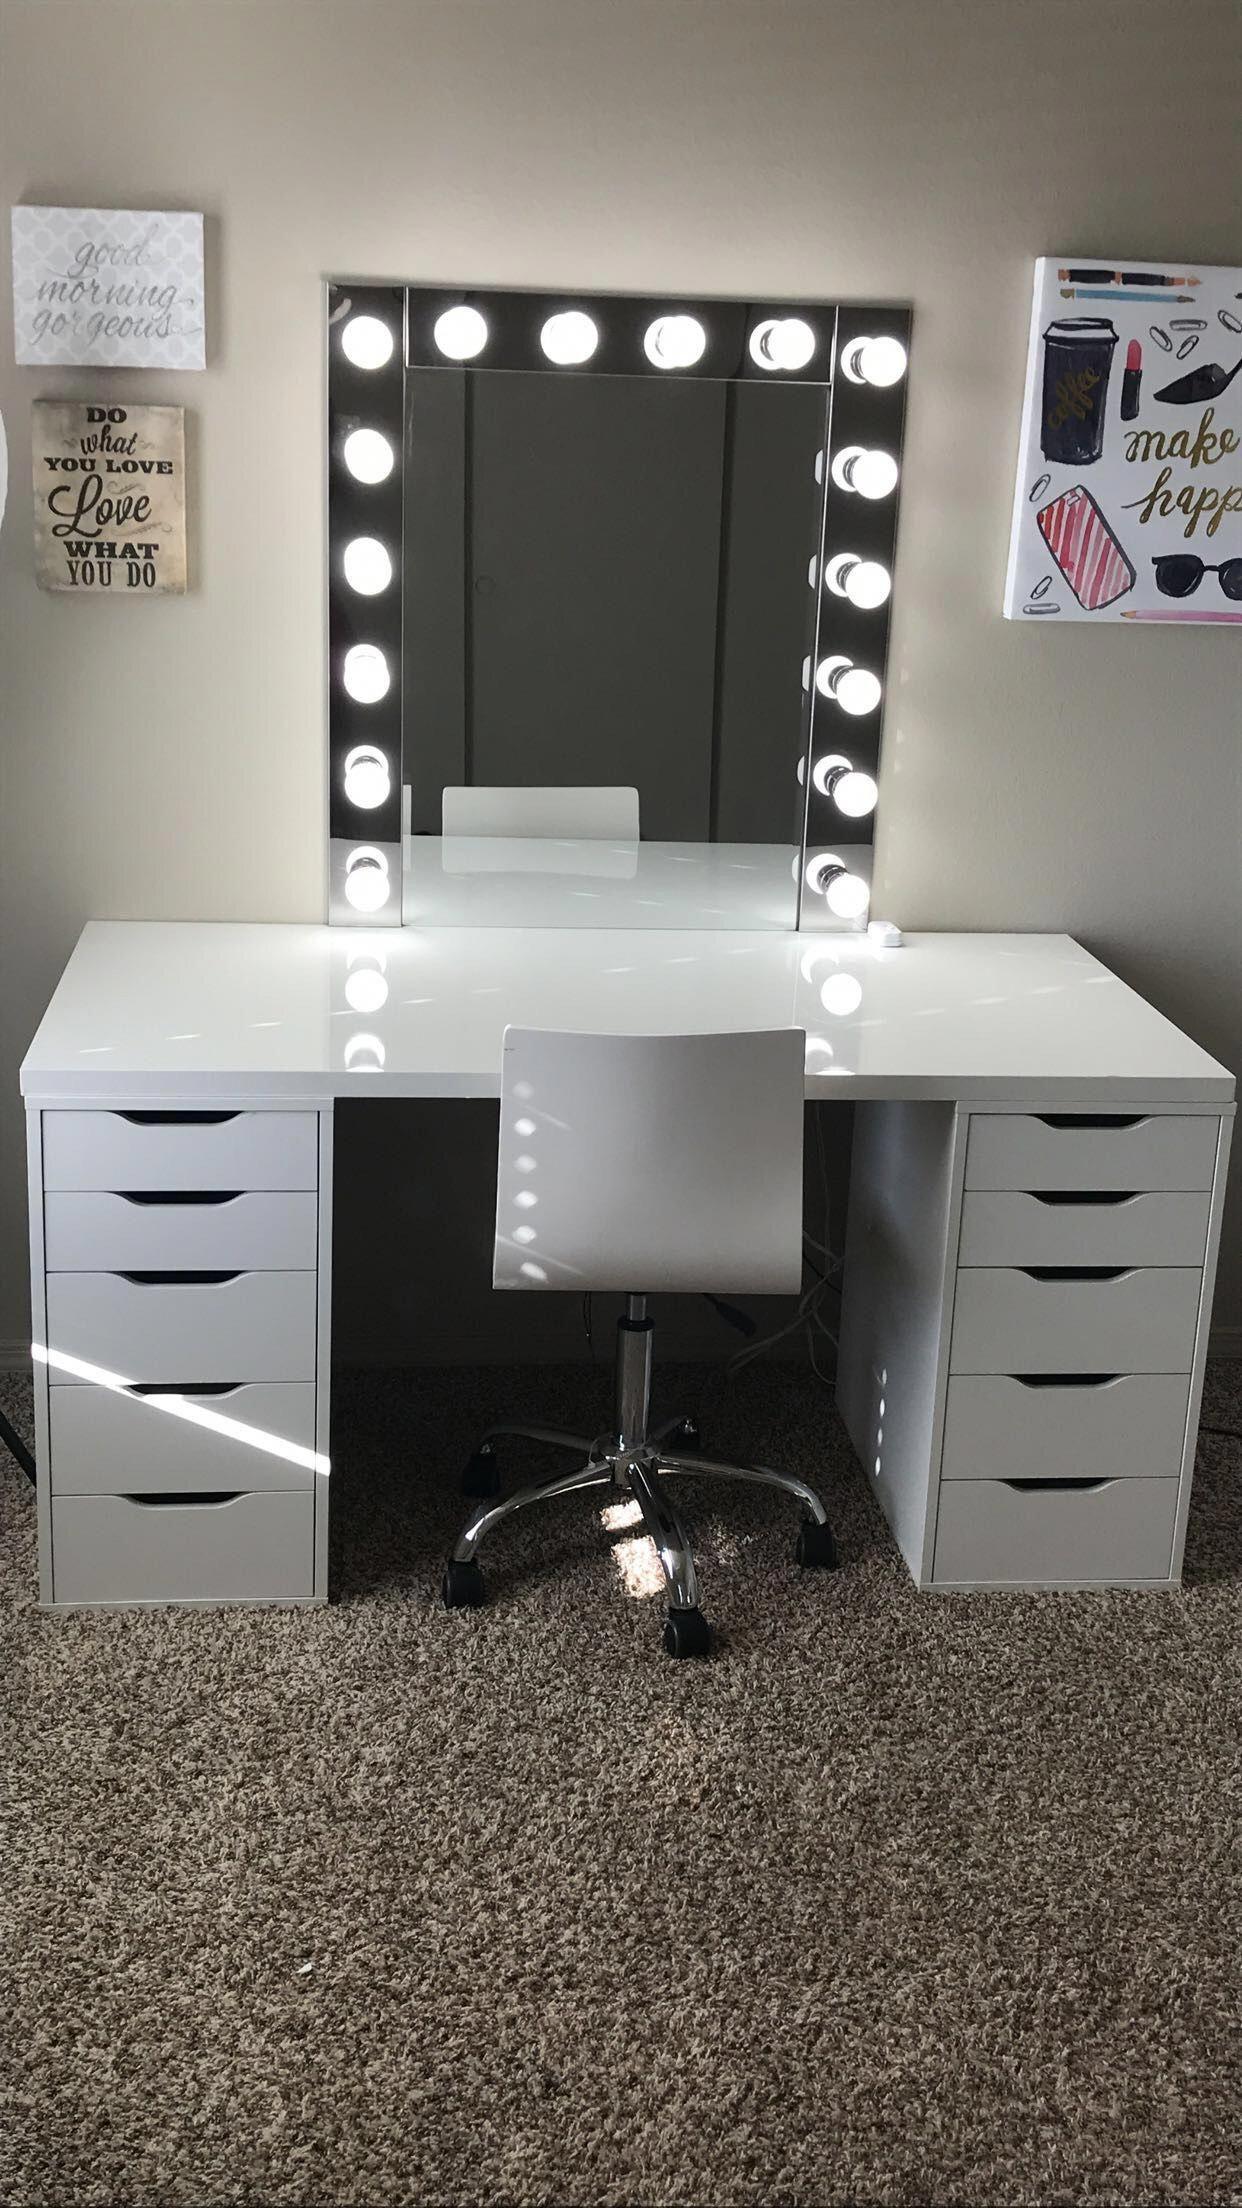 Makeup Room Inspiration I Love This Vanity In My Makeup Room